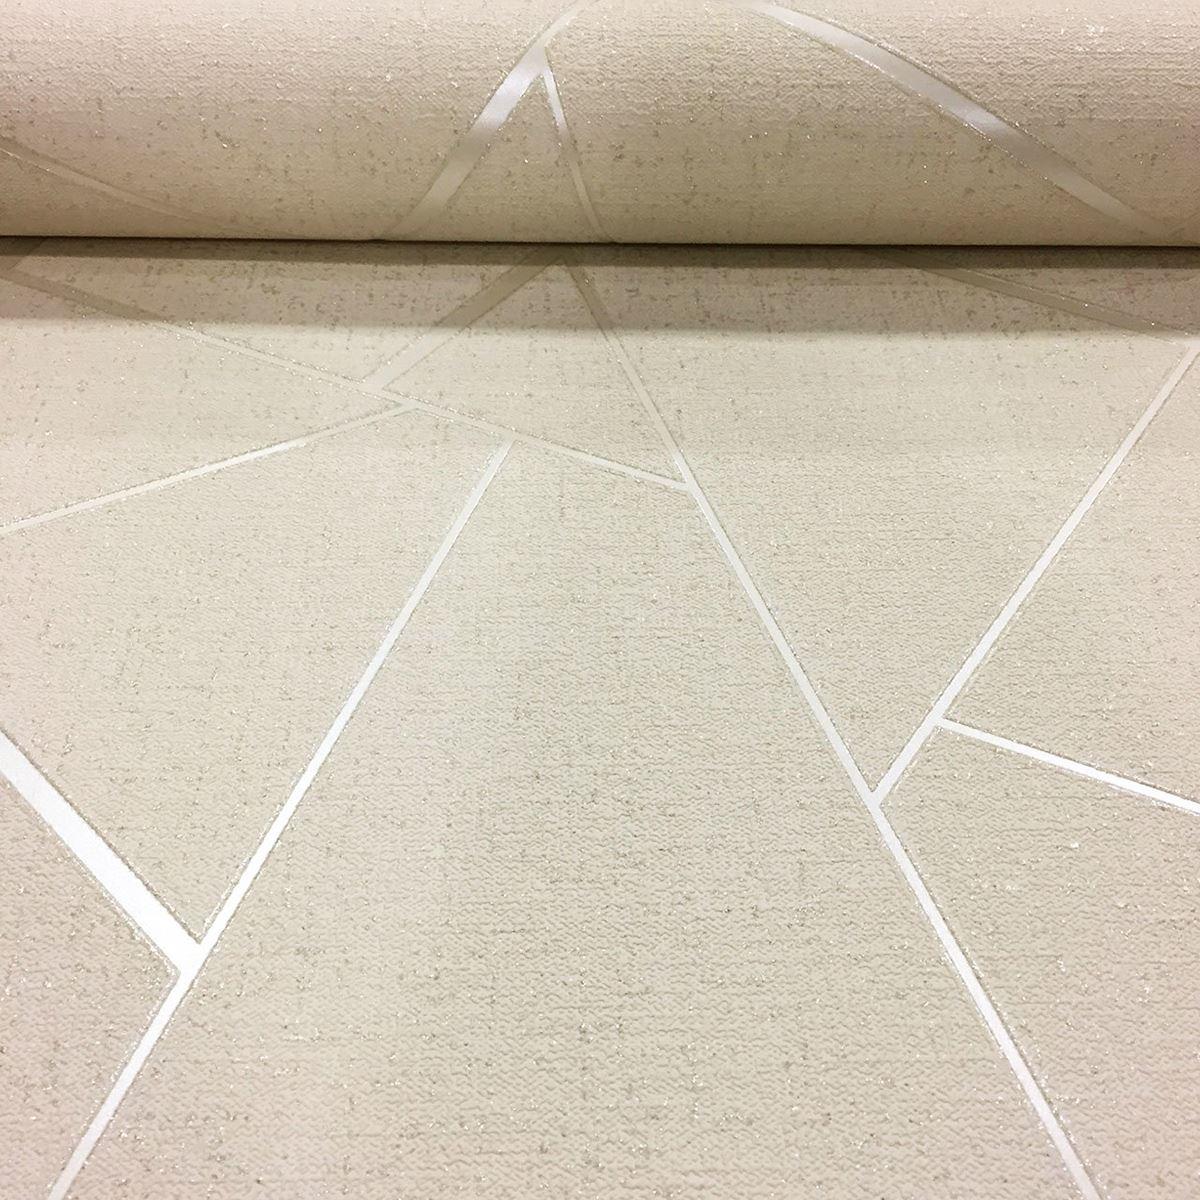 miniatura 44 - Carta da Parati Geometrica Arredamento Camera Moderno Vari Disegni e Colori